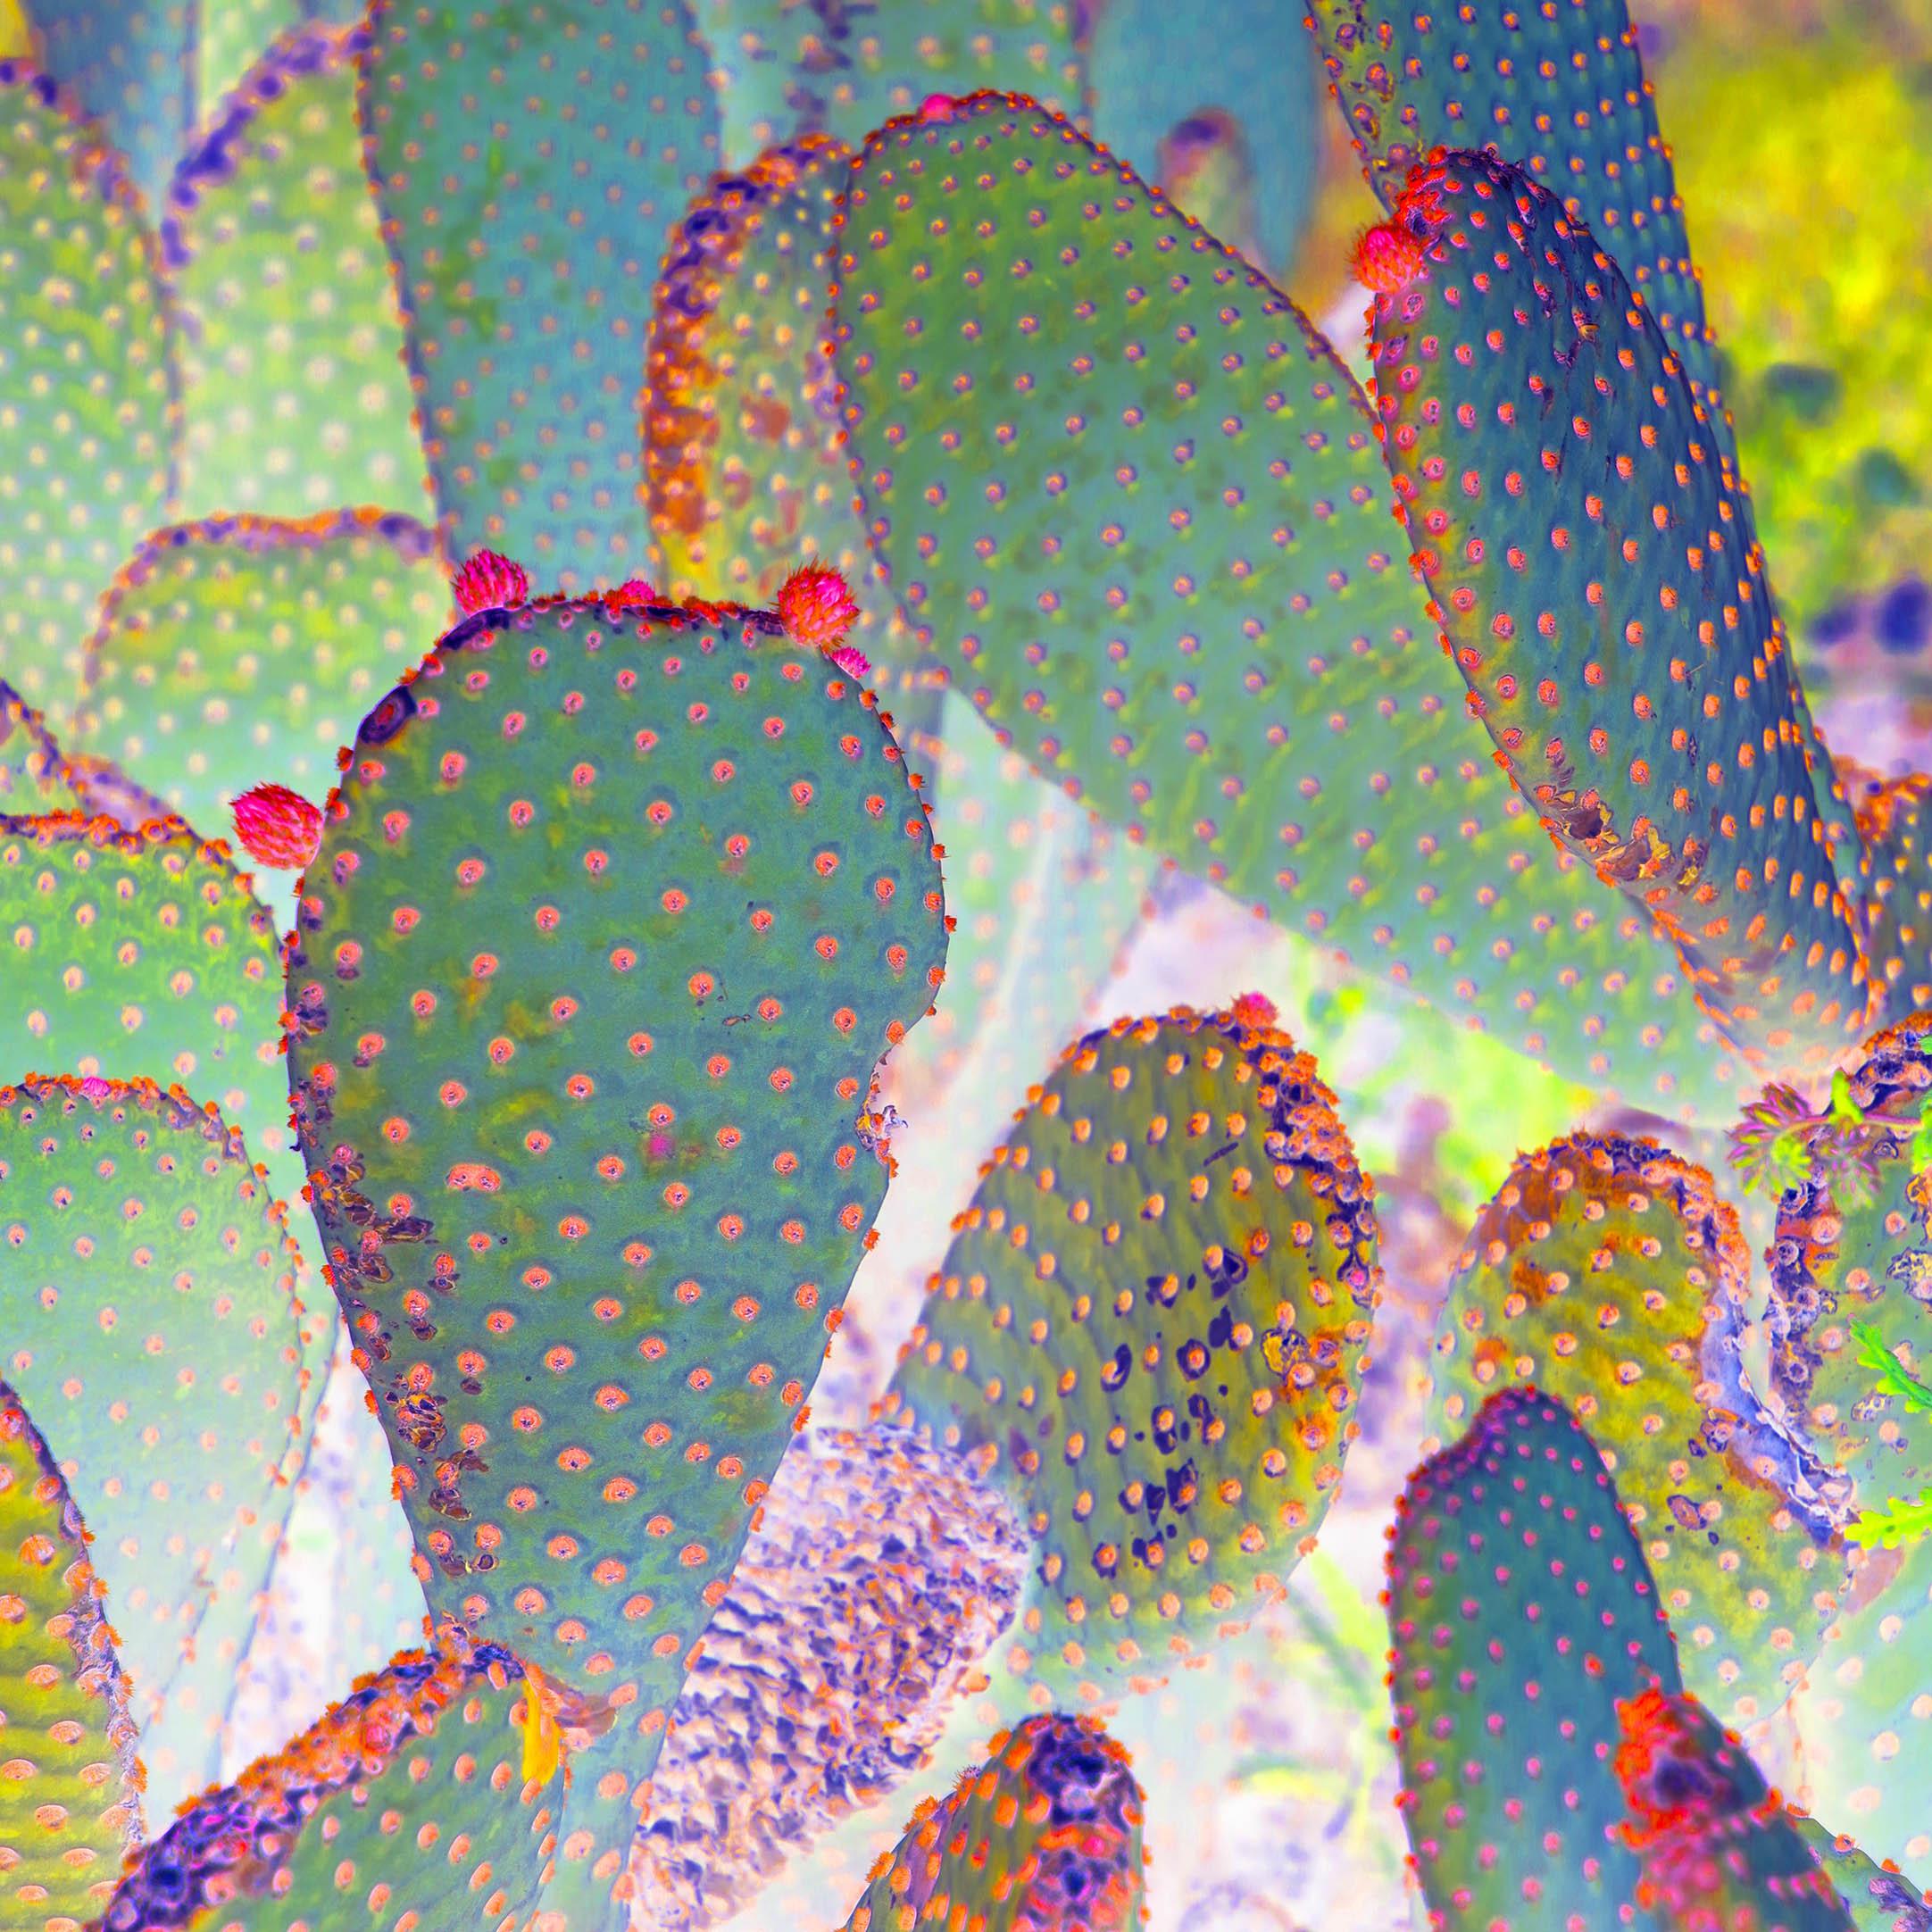 Good Morning Cactus 24x24 FINAL WEBSITE.jpg